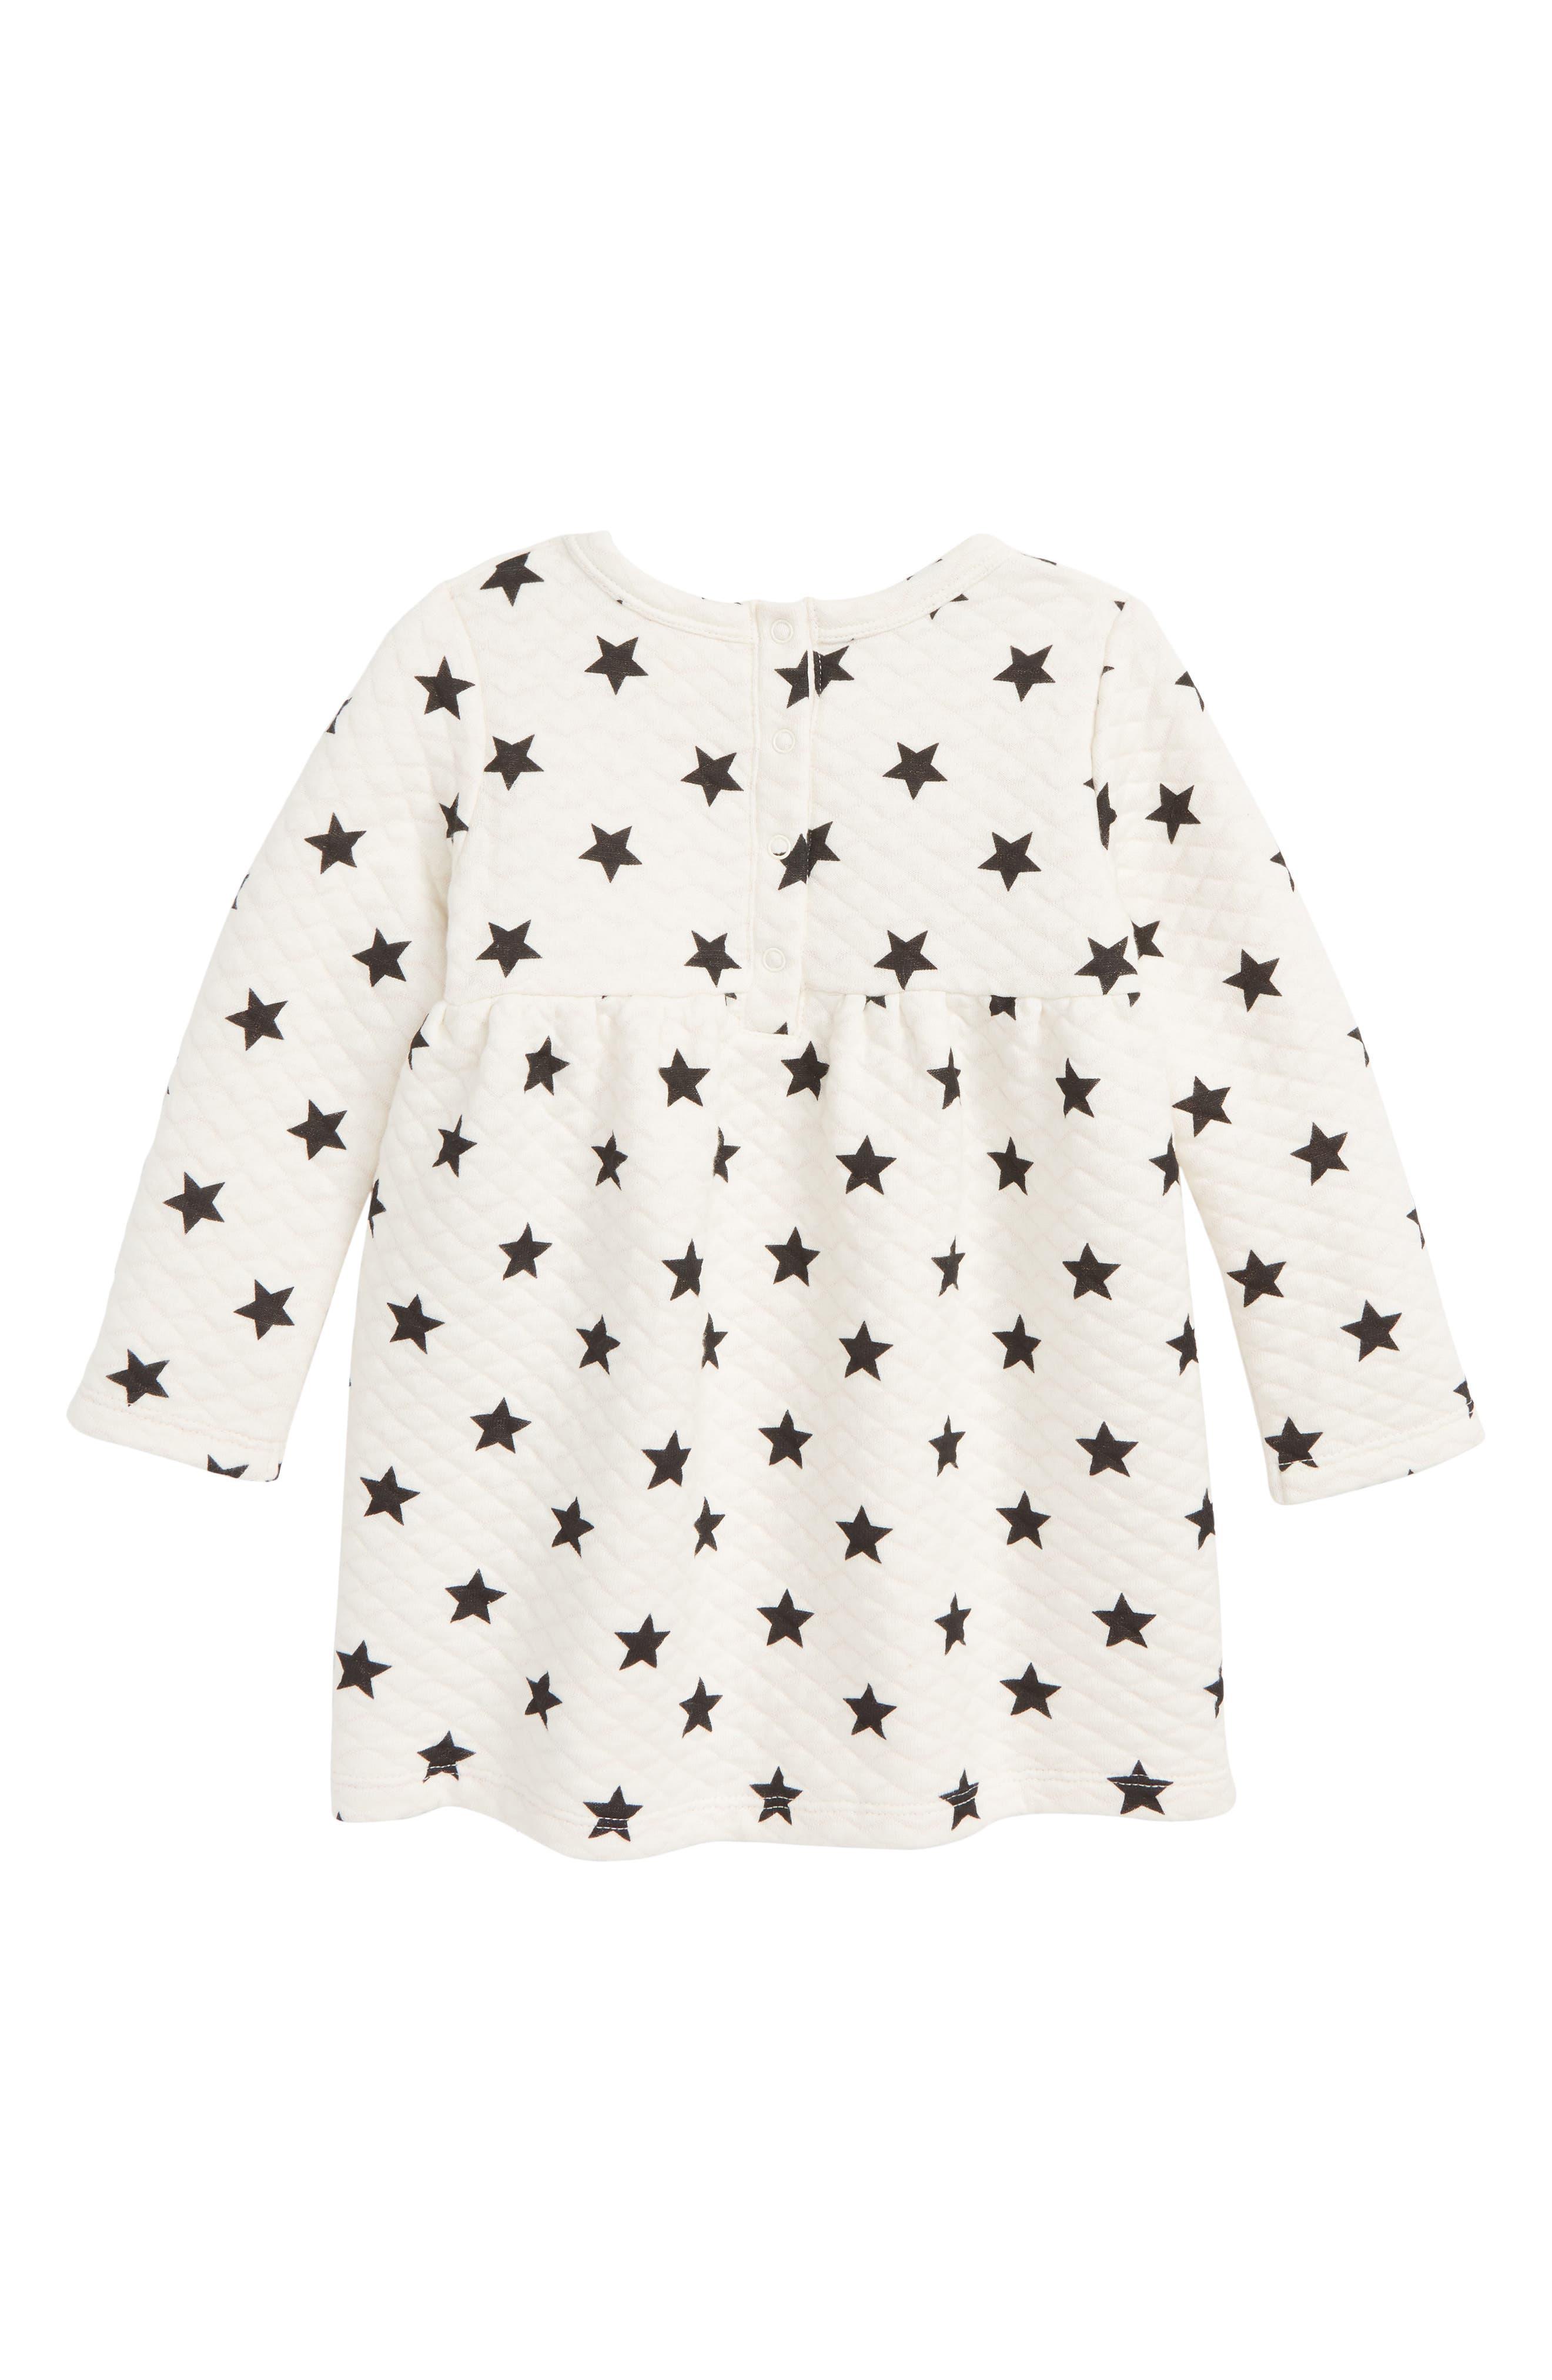 Star Quilted Dress,                             Alternate thumbnail 2, color,                             IVORY EGRET STARS